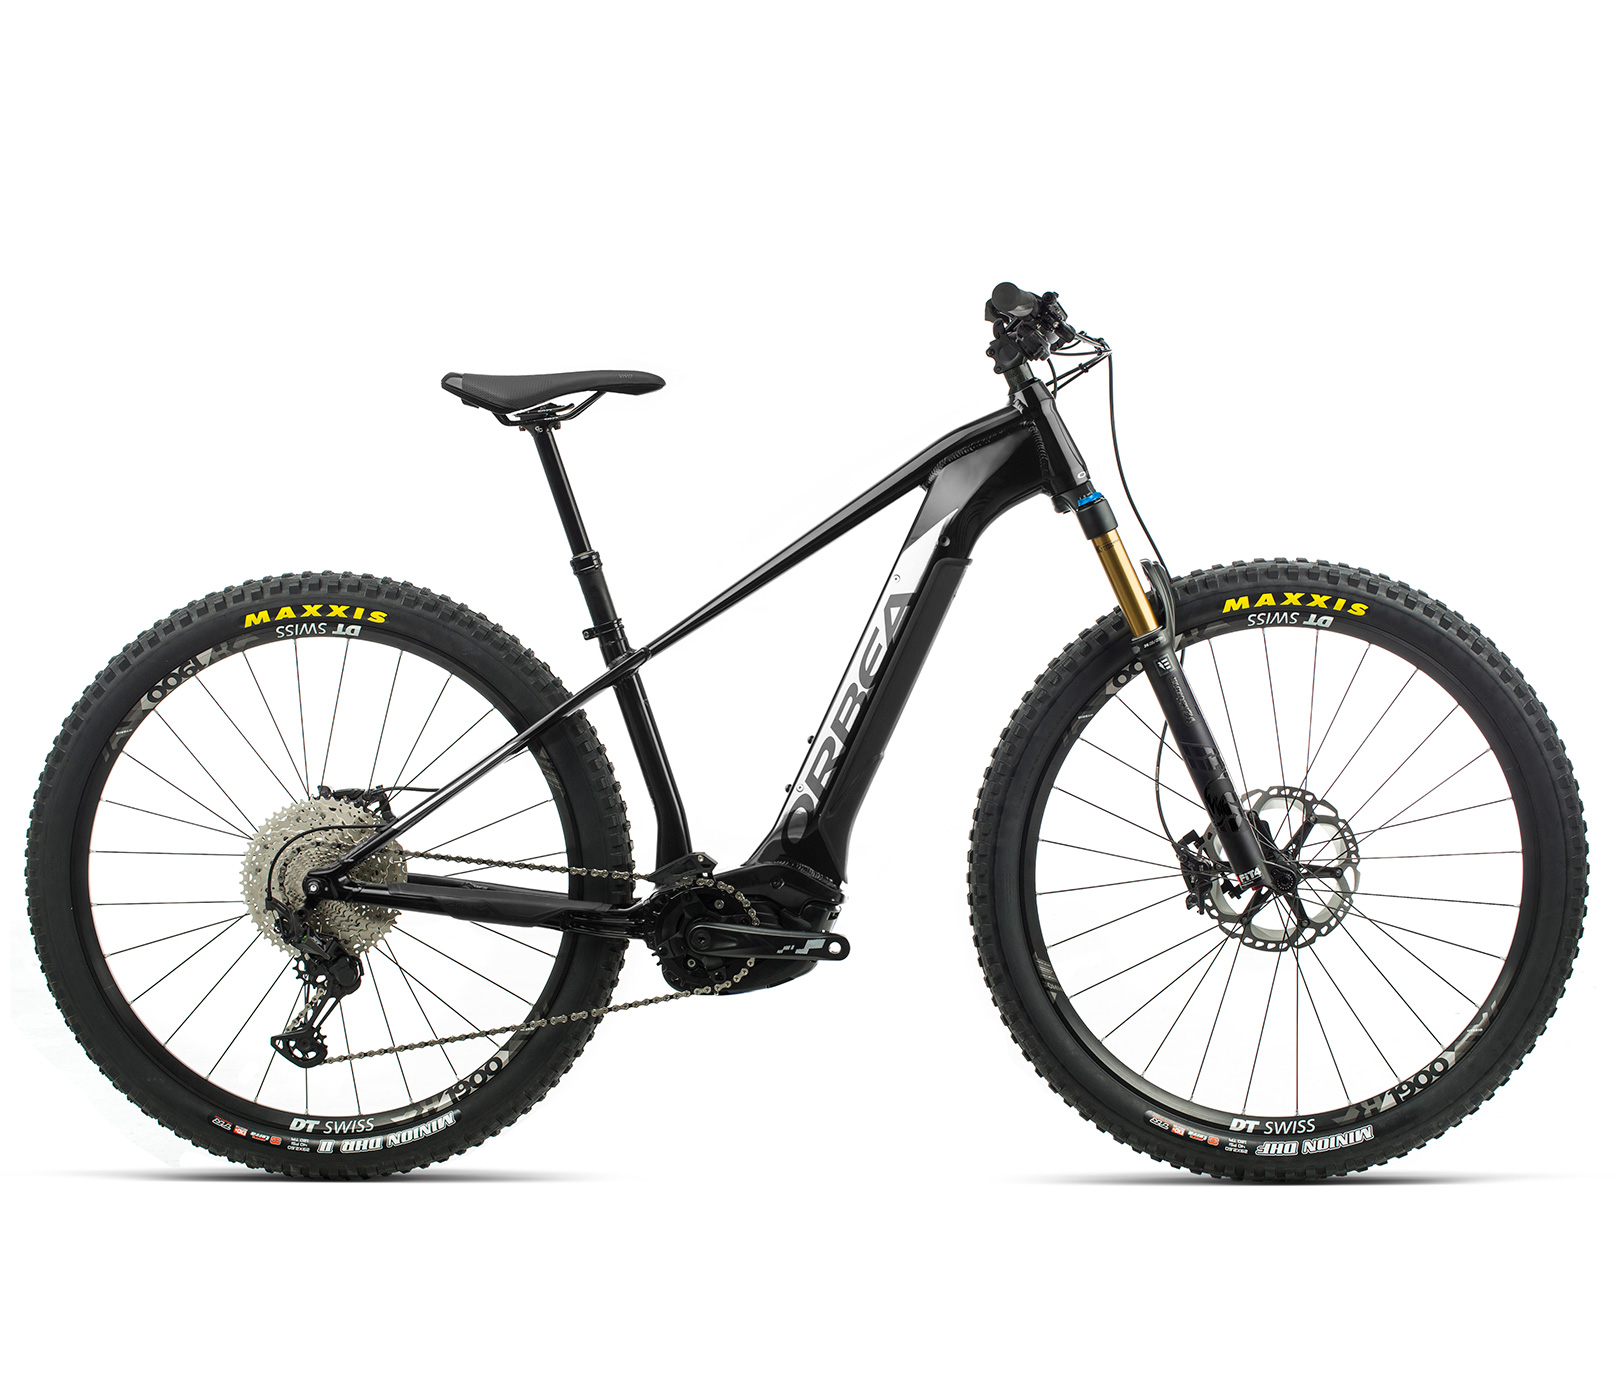 ORBEA WILD HT10 29 ebike - METALLIC ZWART / TITANIUM(GLOSS) @G-Bikes